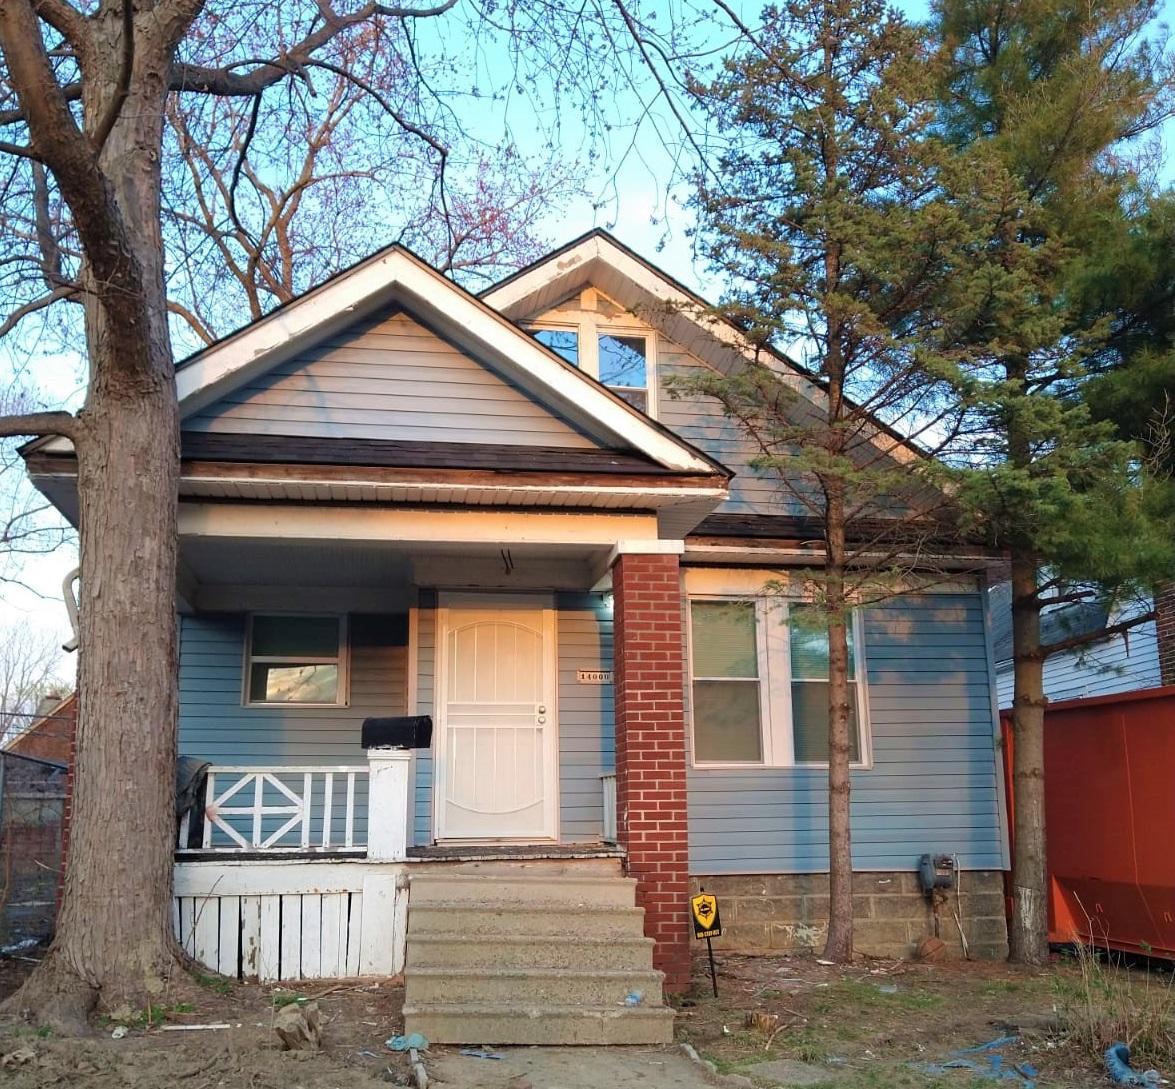 Foto de 14000 Freeland St., Detroit, MI, 48227